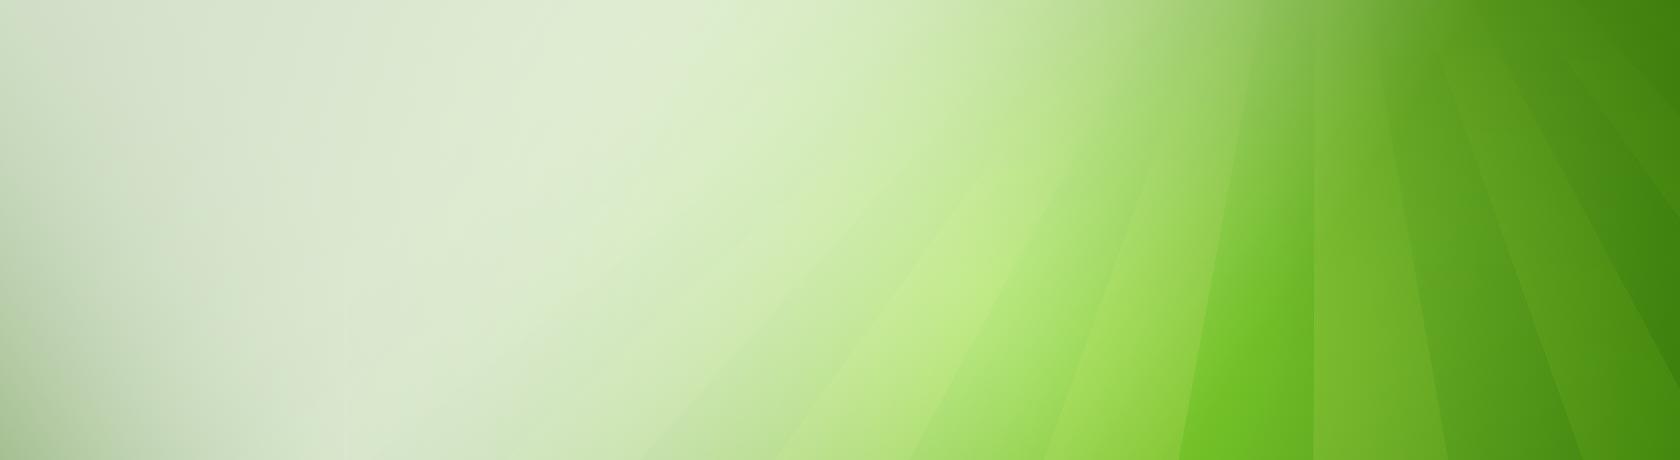 https://img.ui-portal.de/cms/gmx/produkte/allnet/nbs/2018/Juni/standard/allnet_visual_1680x460.jpg